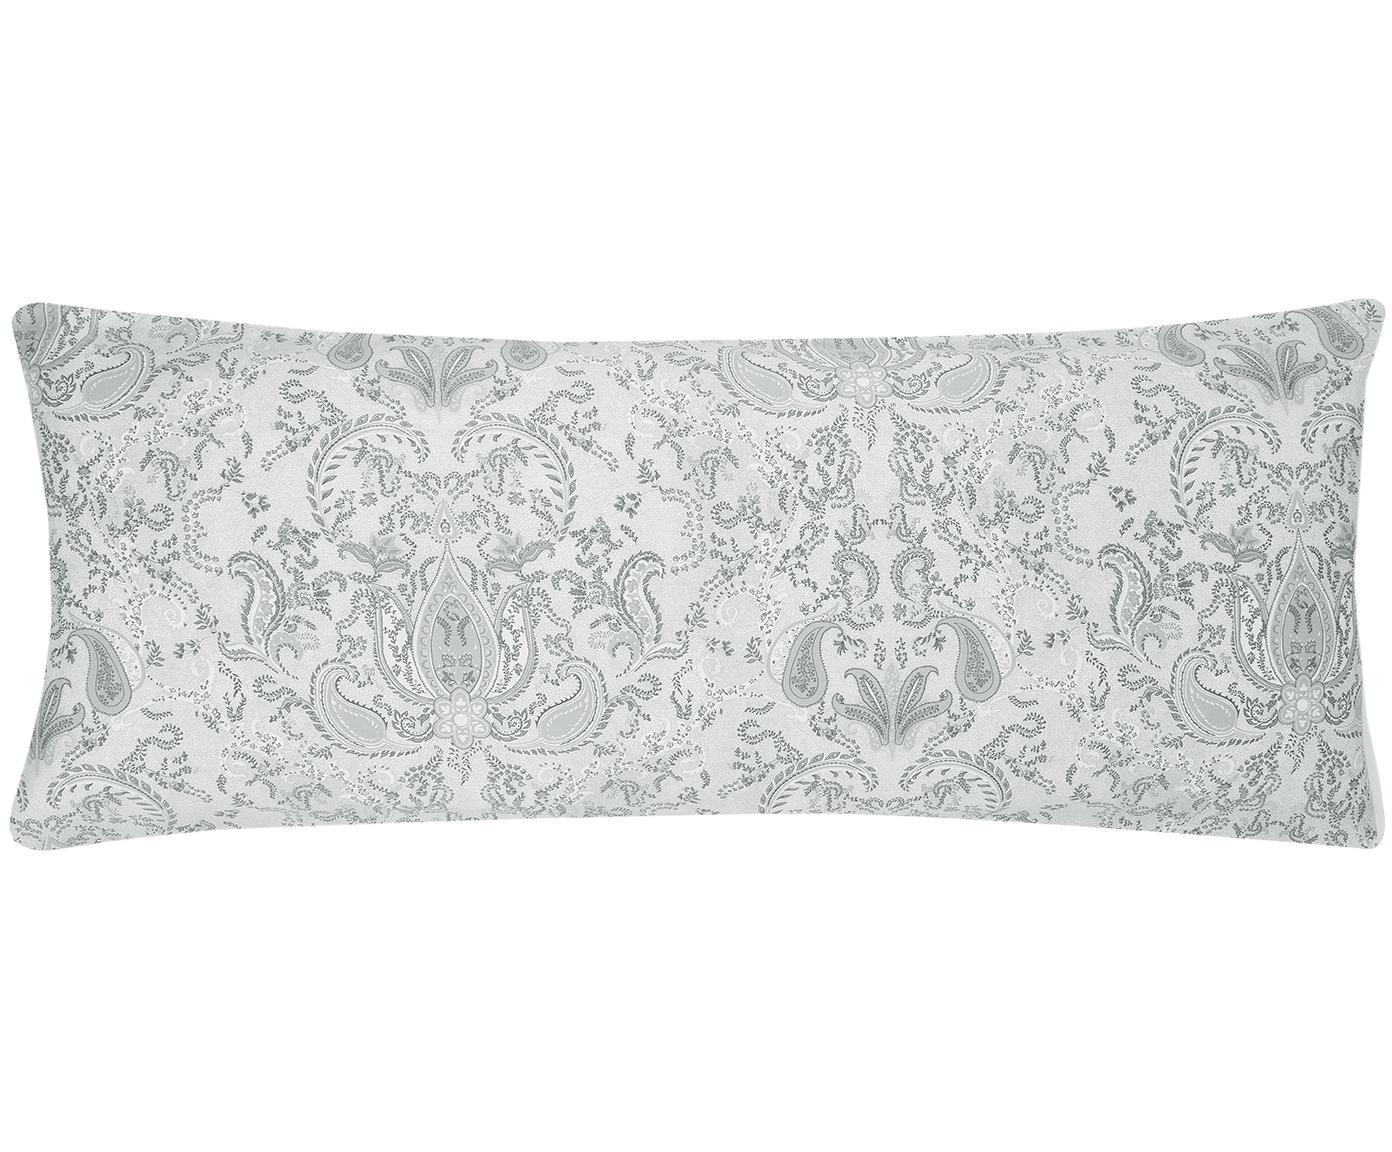 Funda de almohada de satén Grantham, Gris claro, An 45 x L 110 cm